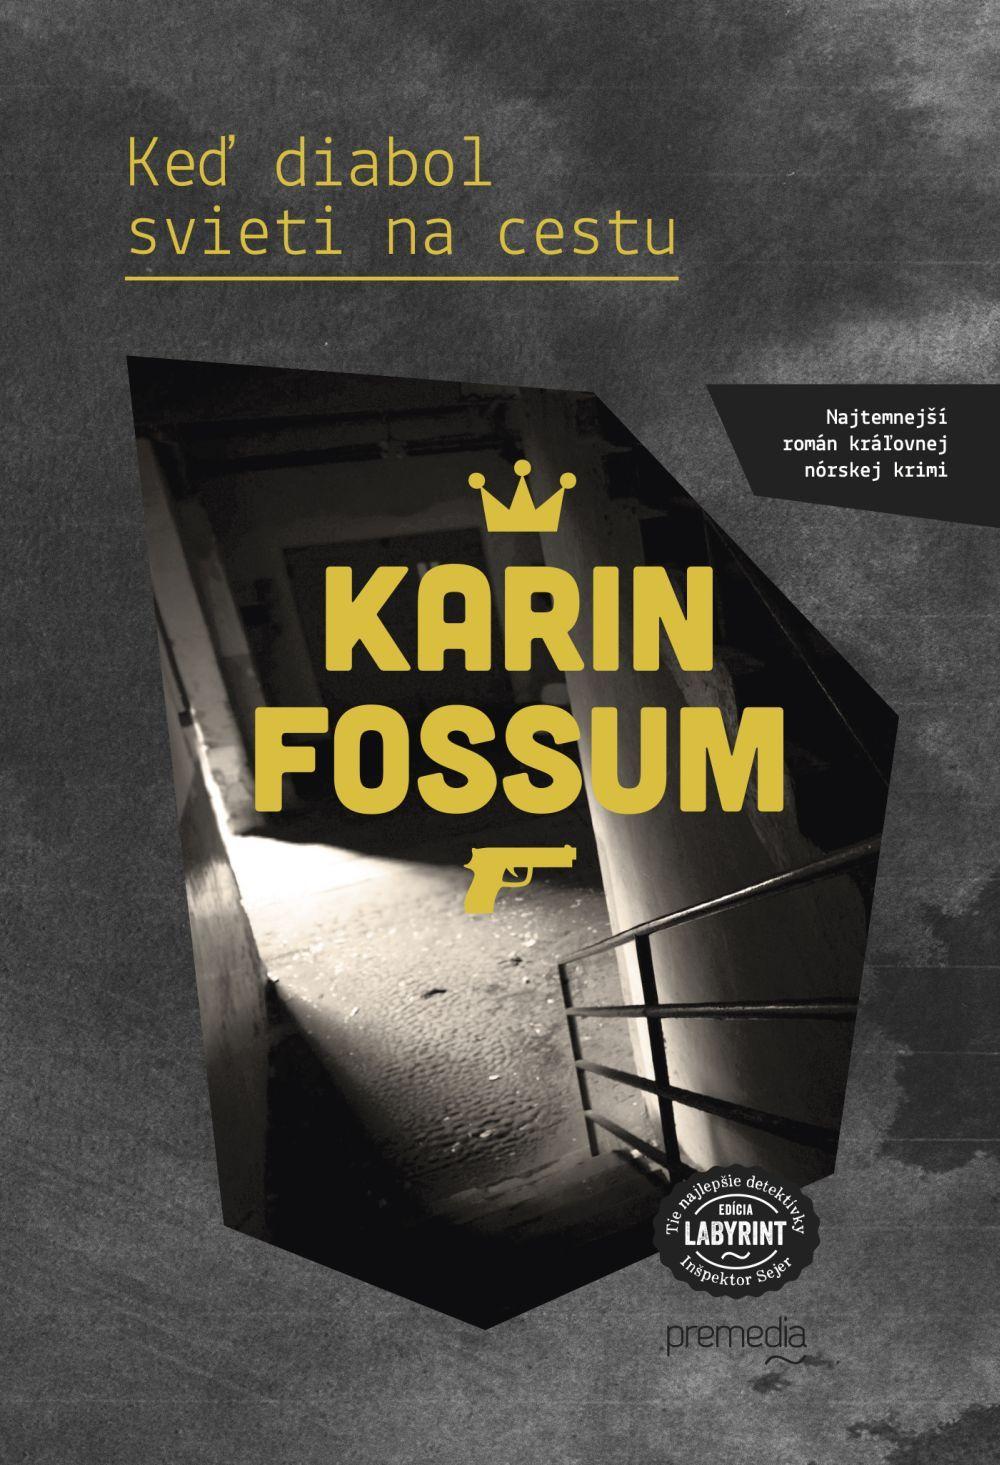 Keď diabol svieti na cestu (Inspector Konrad Sejer, #4)  by  Karin Fossum